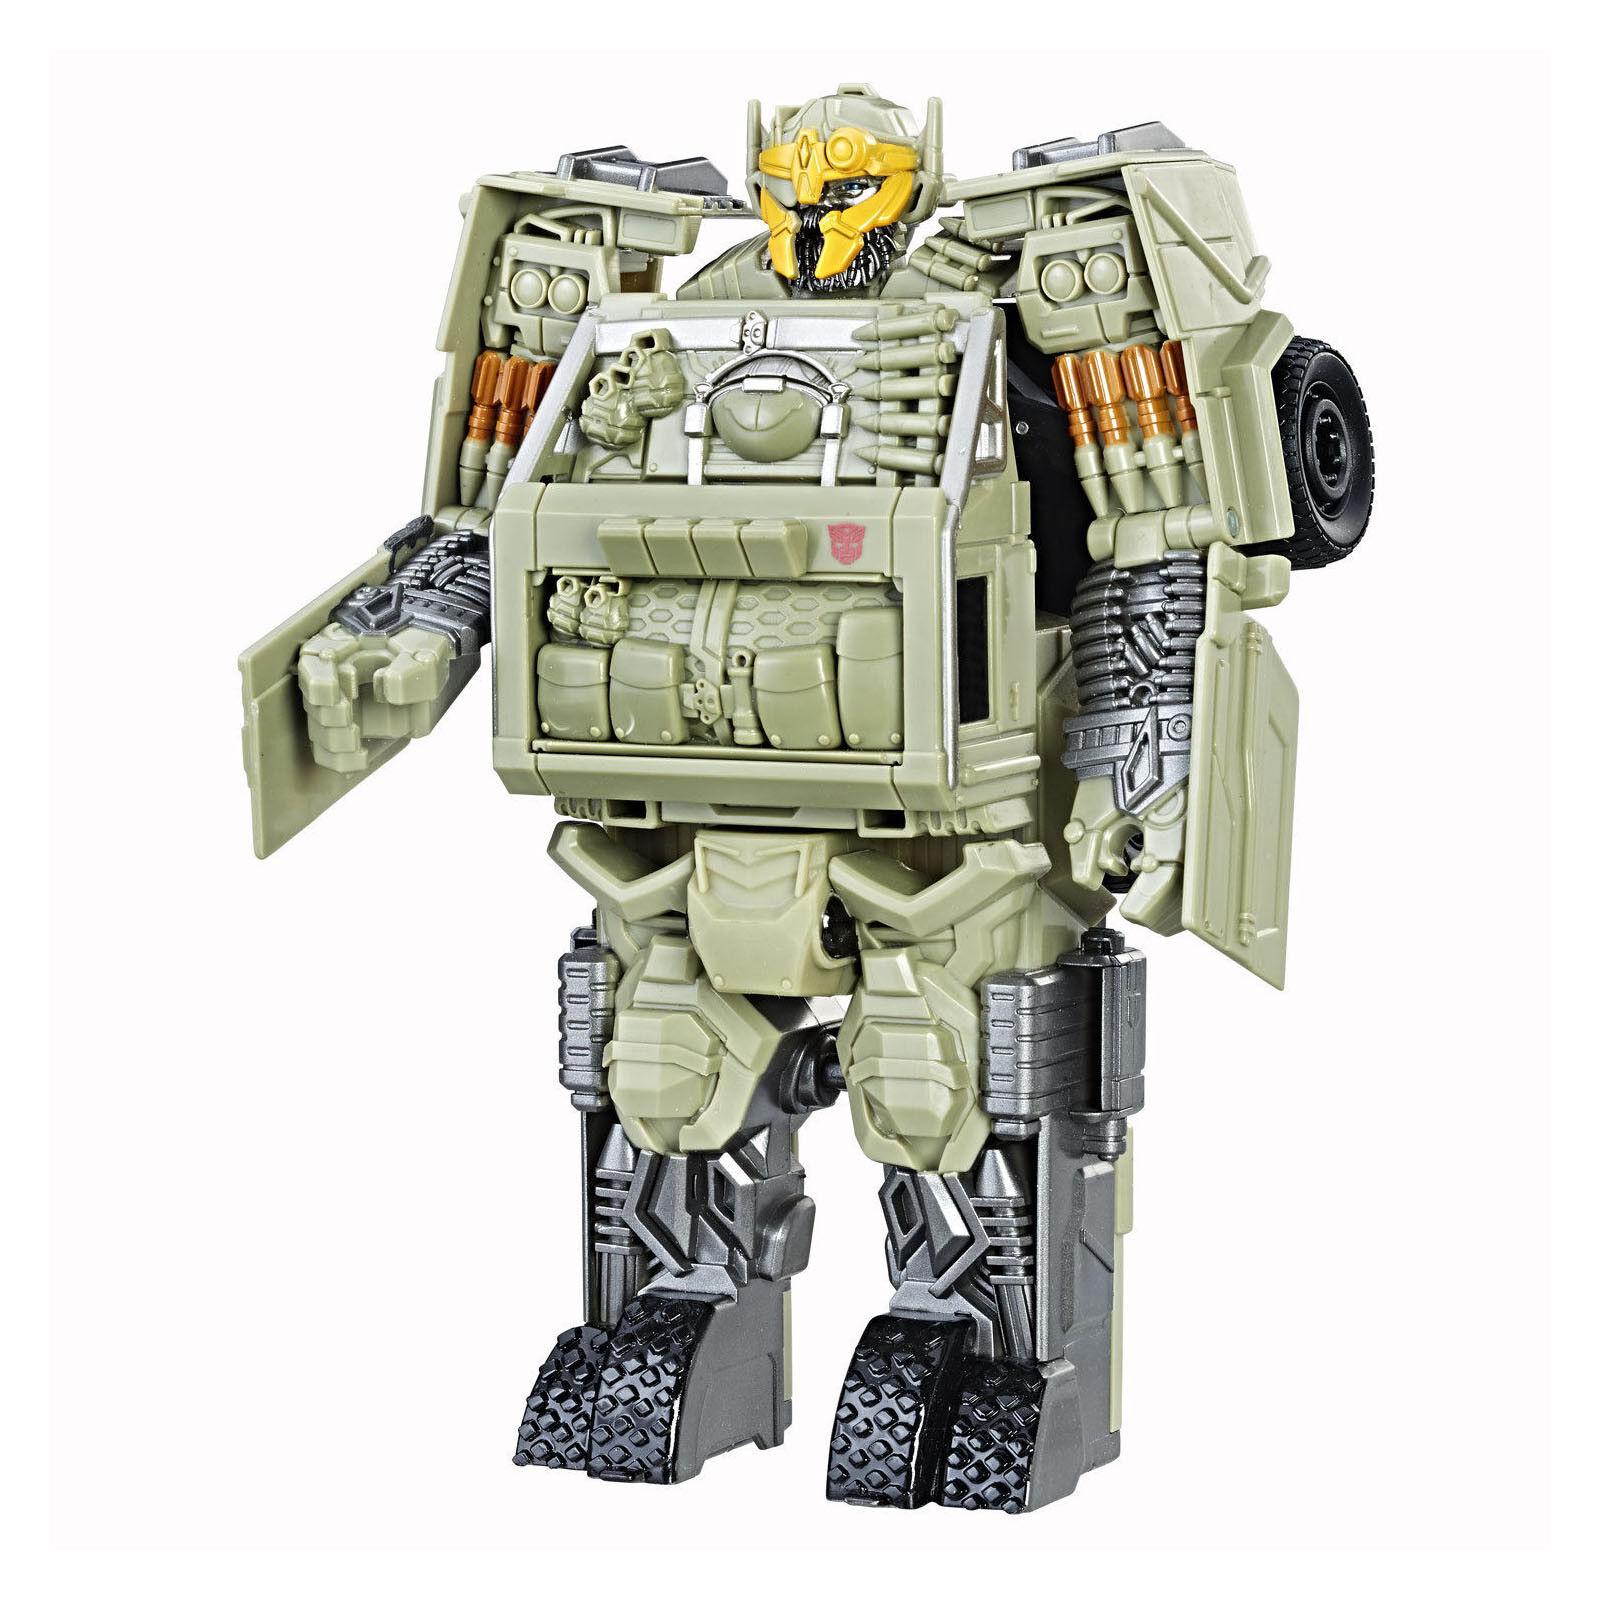 Transformers Movie 5 The Last Knight Turbo Changer AUTOBOT HOUND Robots Kids